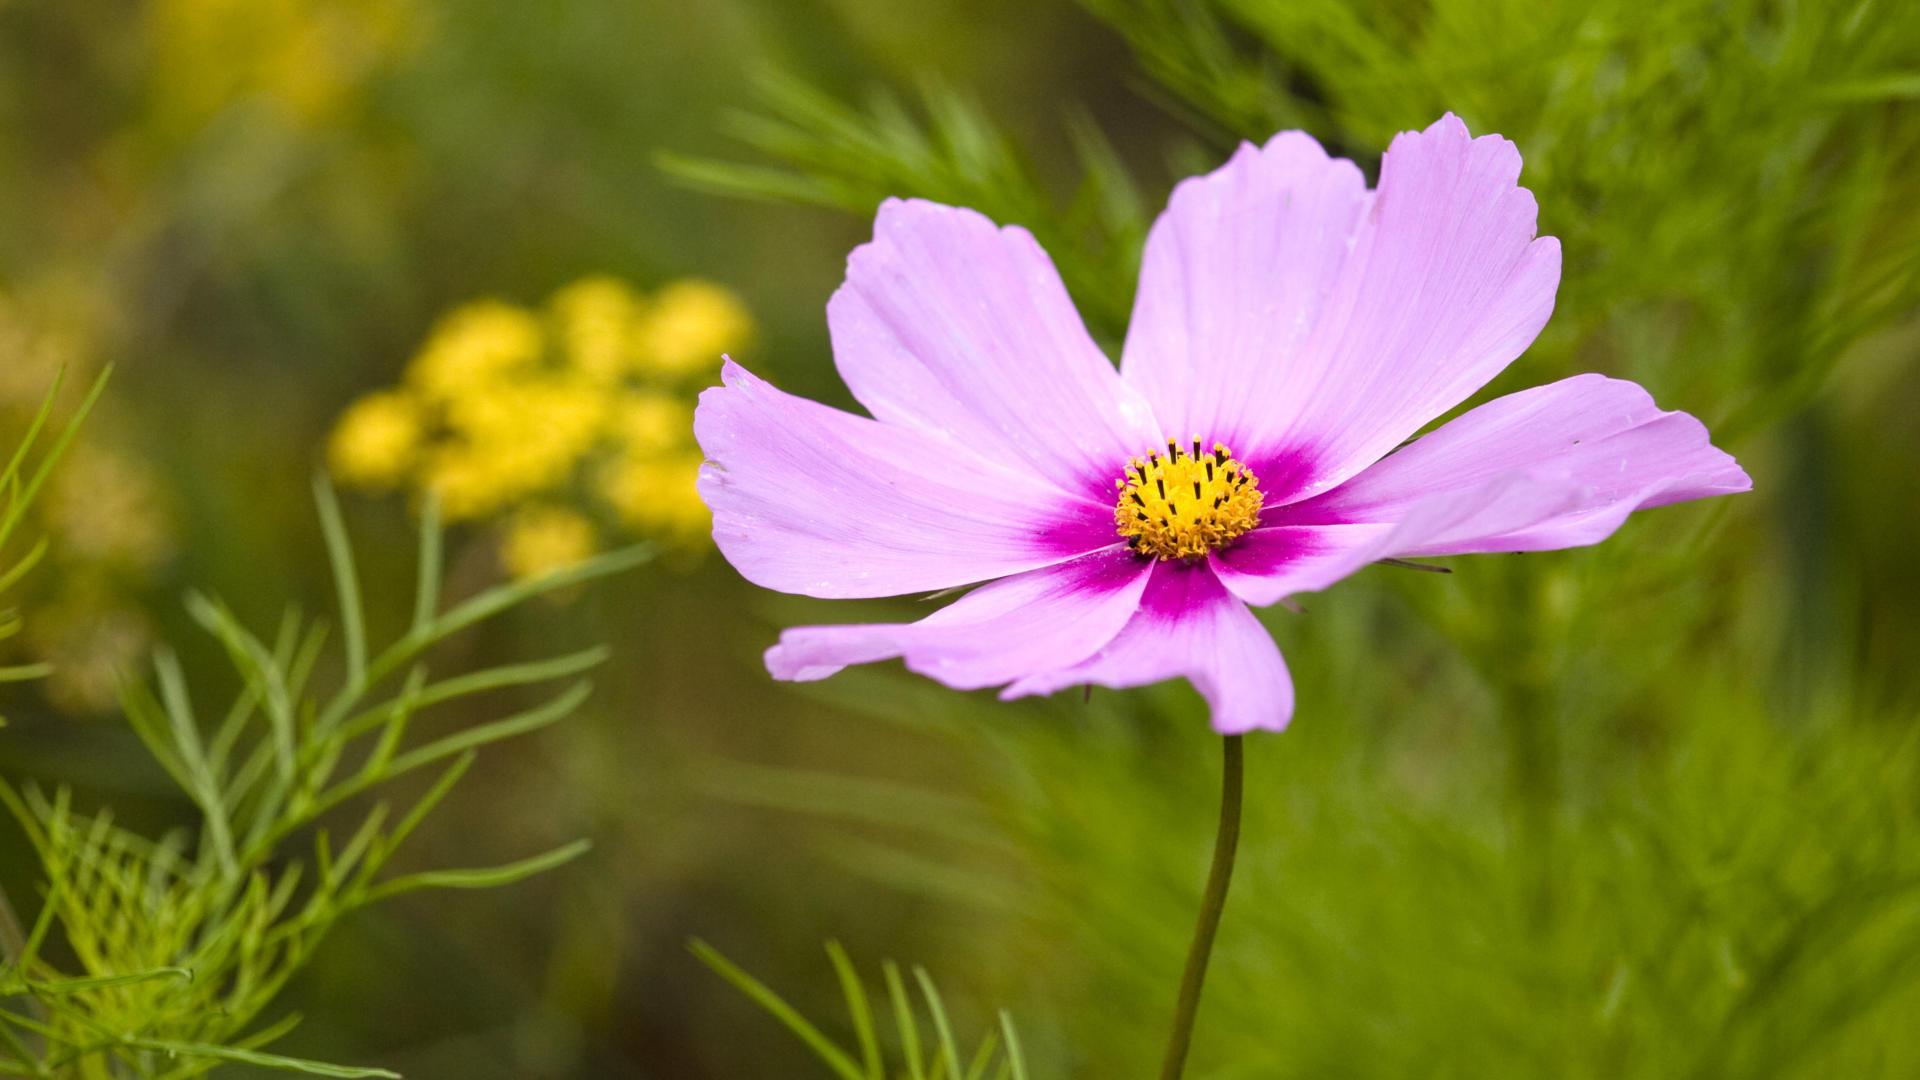 cosmos flower - HD Desktop Wallpapers | 4k HD